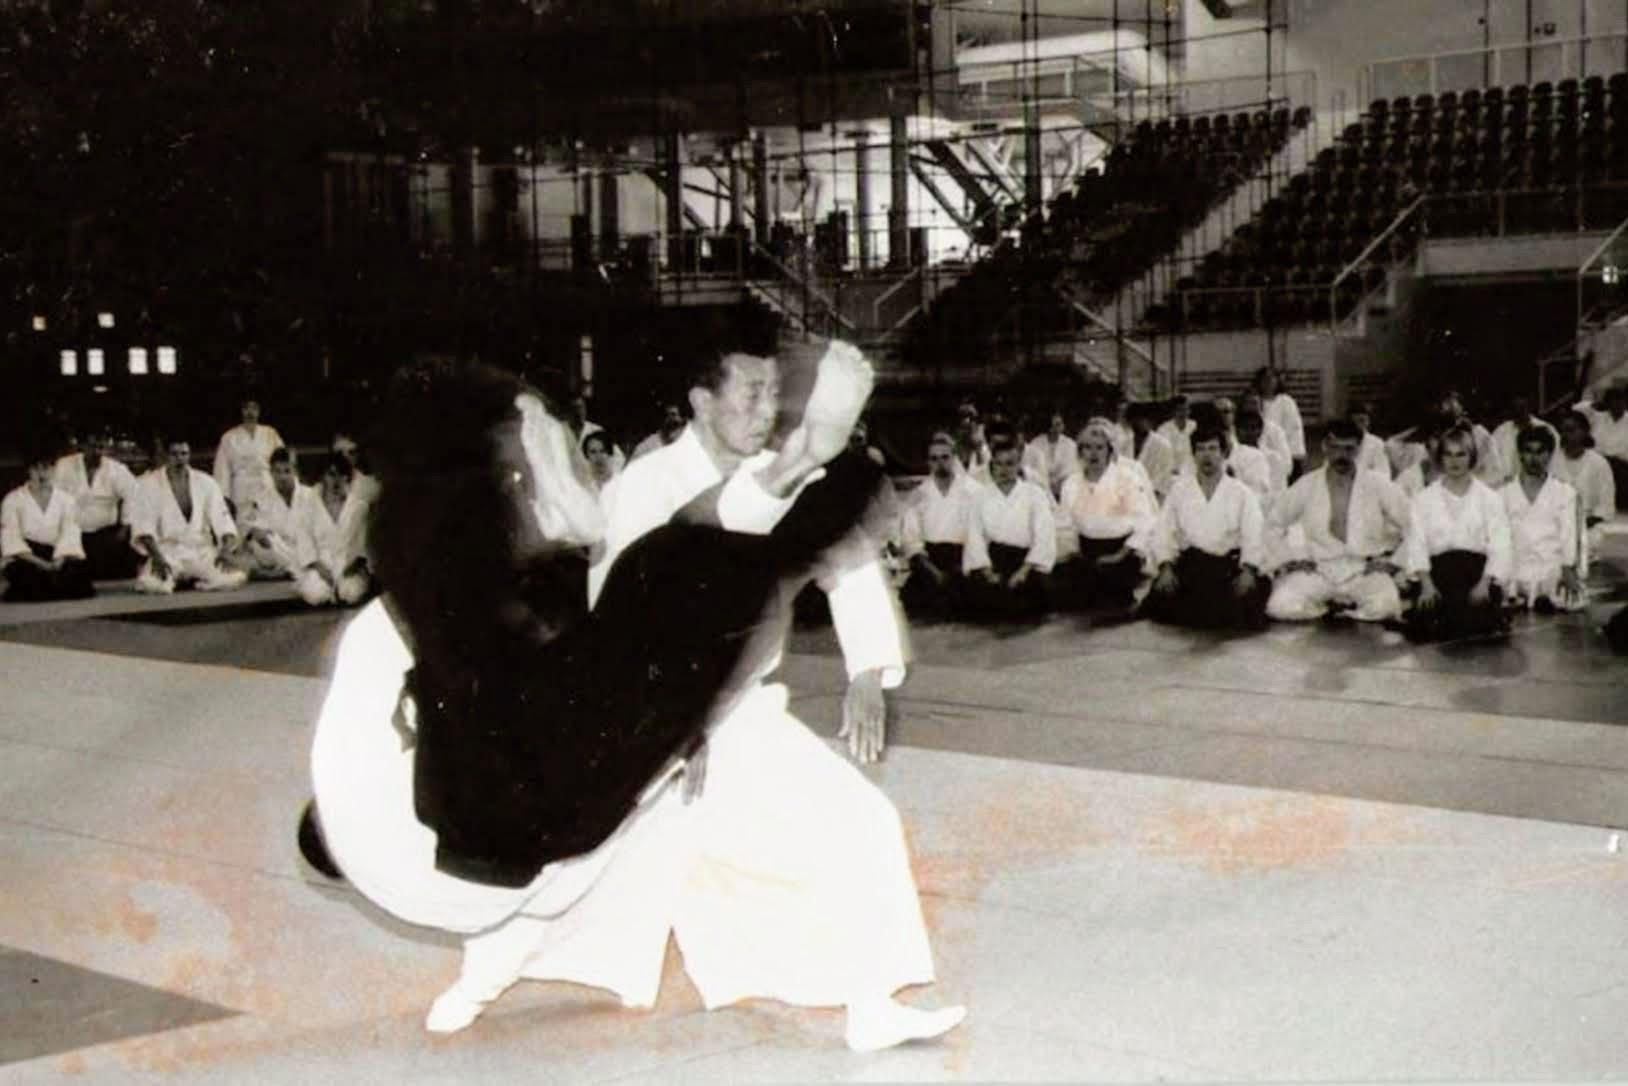 Hikitsuchi sensei : enseignements essentiels de l'aïkido